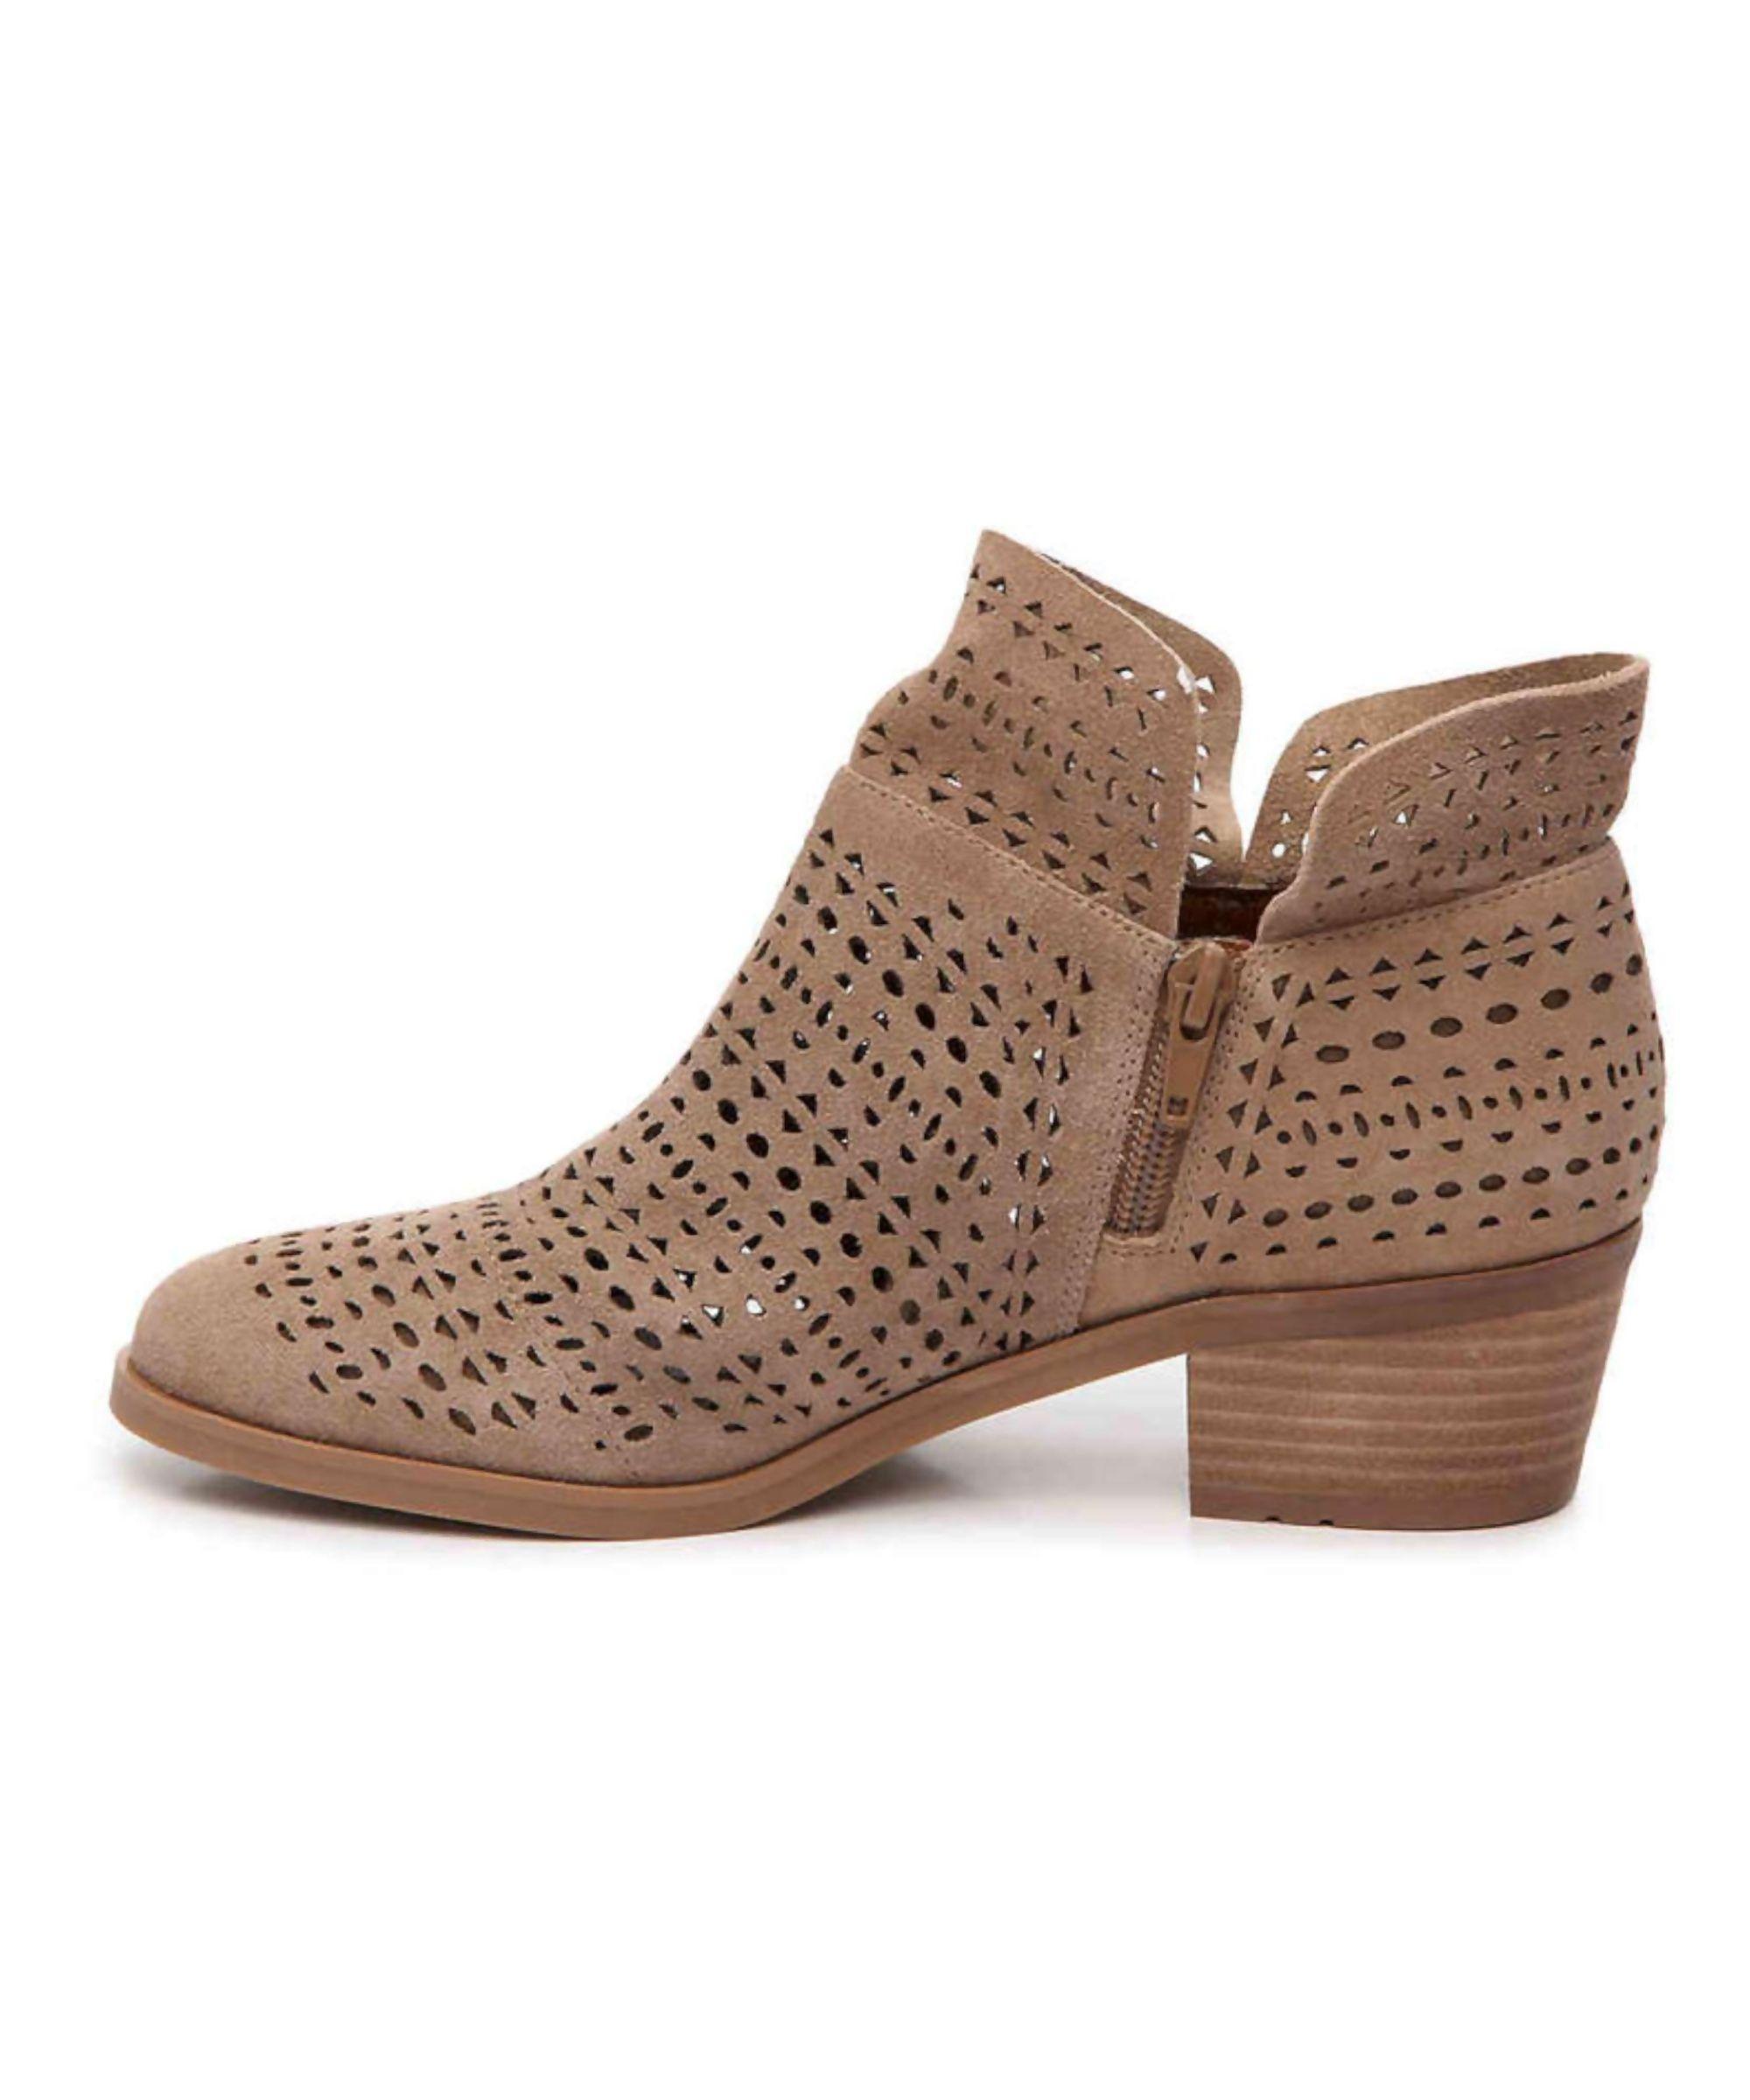 CROWN VINTAGE | Crown Vintage Womens Telsa Closed Toe Ankle Fashion Boots # Shoes #Boots